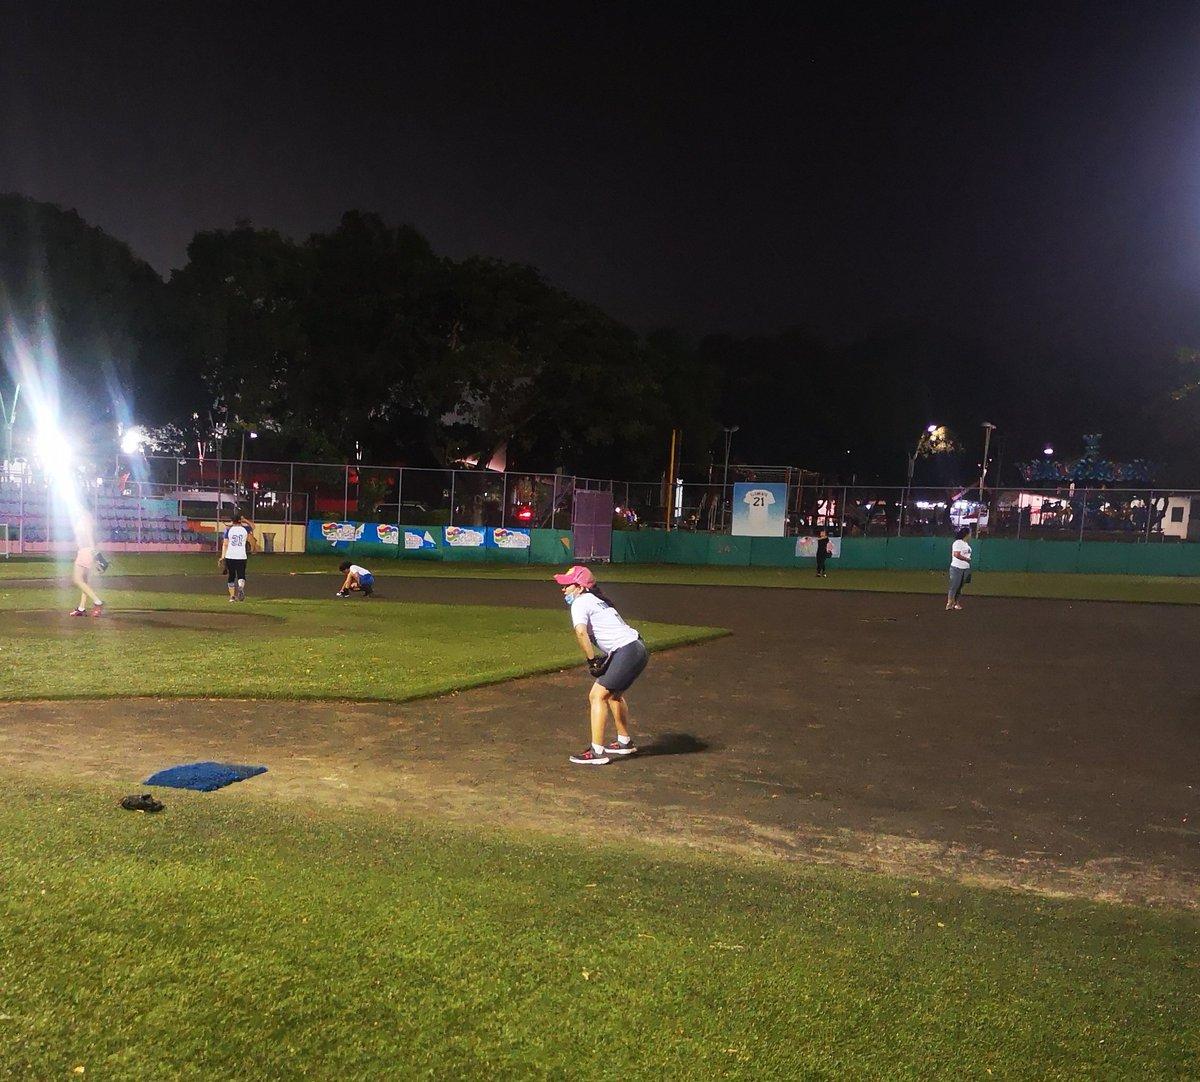 #thursdayvibes #practiceday #softball ⚾